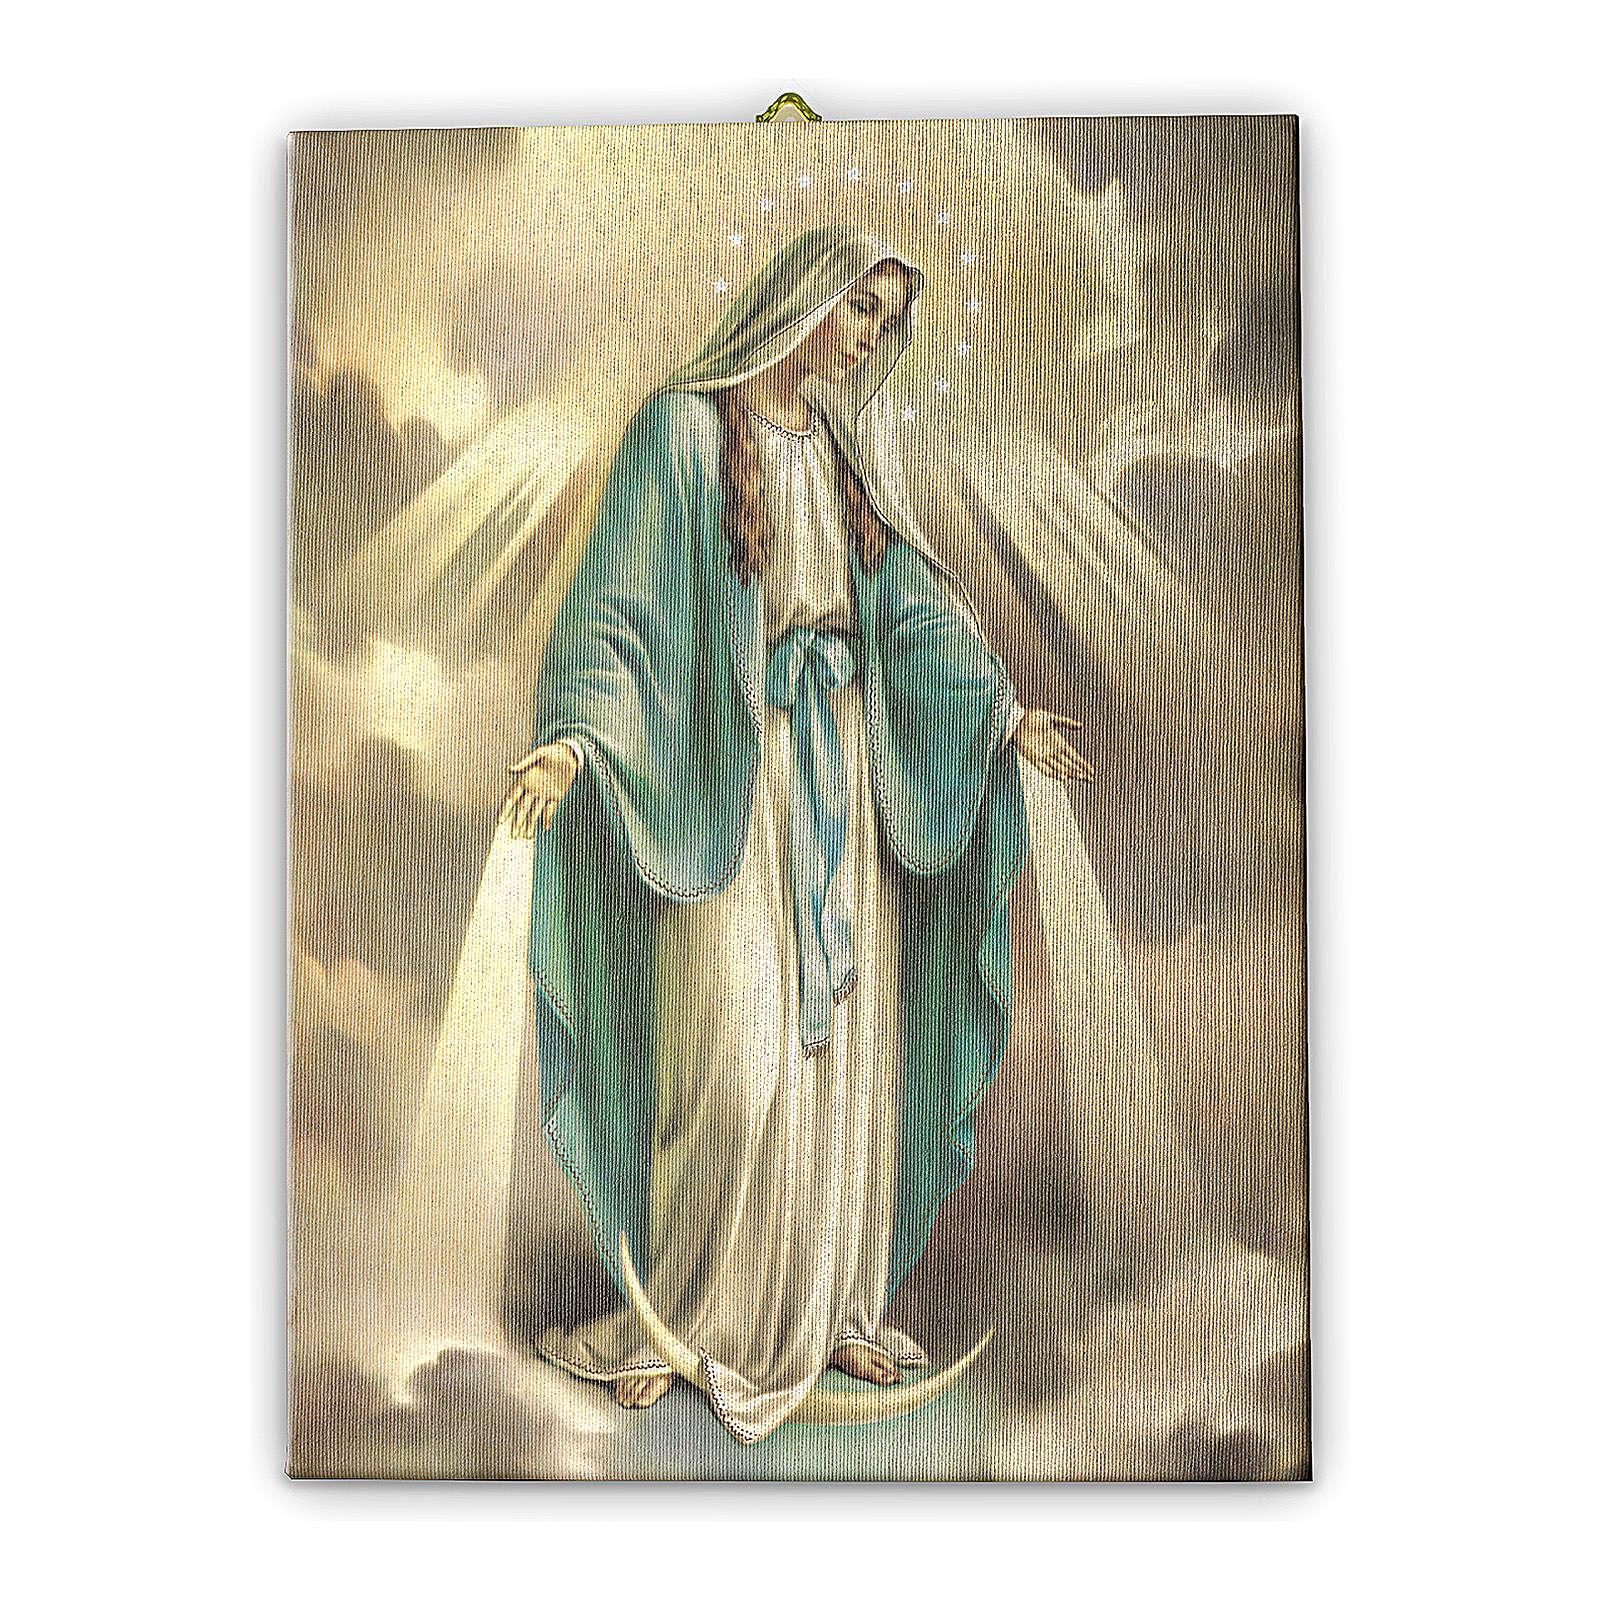 Cuadro sobre tela pictórica Virgen Milagrosa 25x20 cm 3